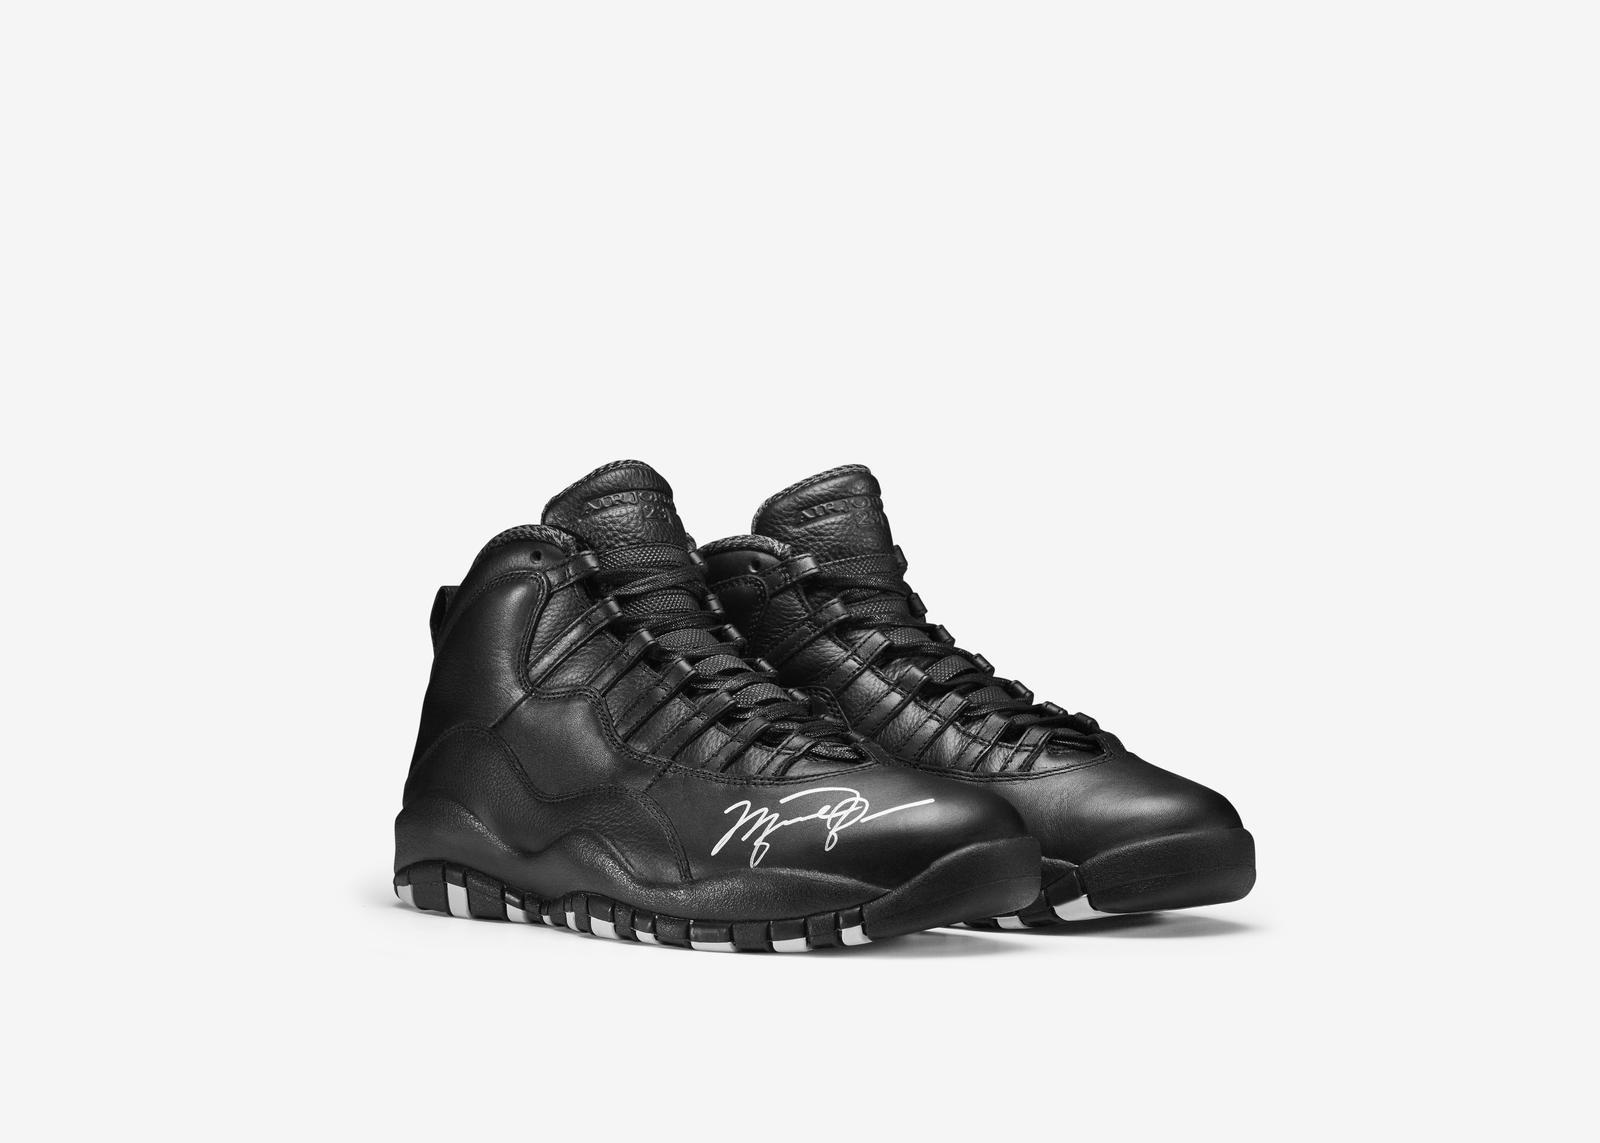 Nike jordan x auction m sz10 bty mj rectangle 1600